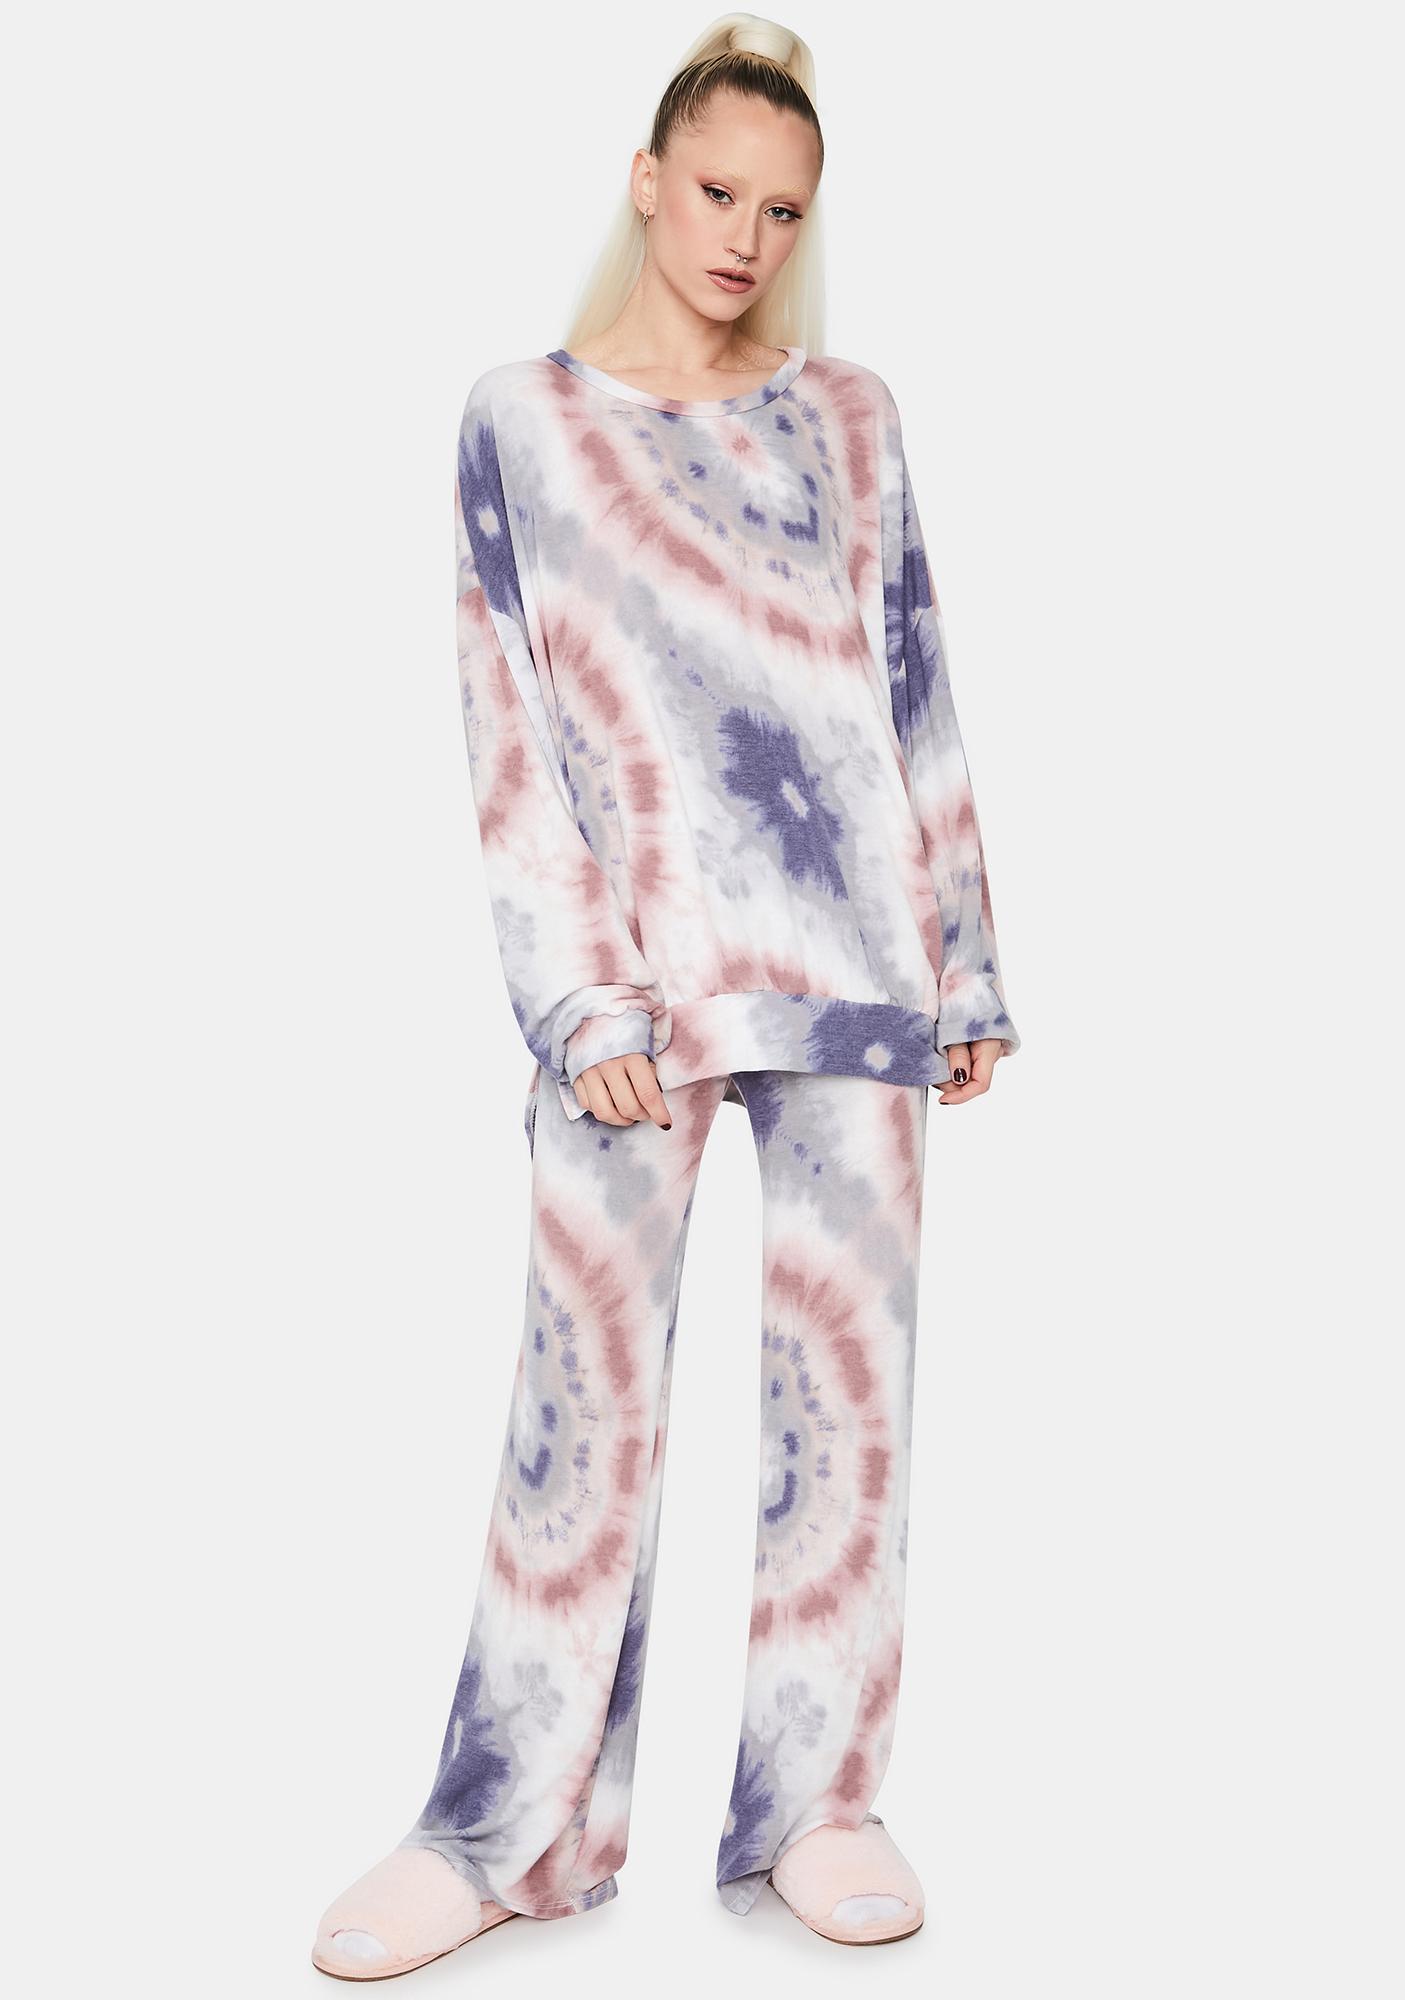 Aqua Coast Cruisin' Tie Dye Crewneck Pullover